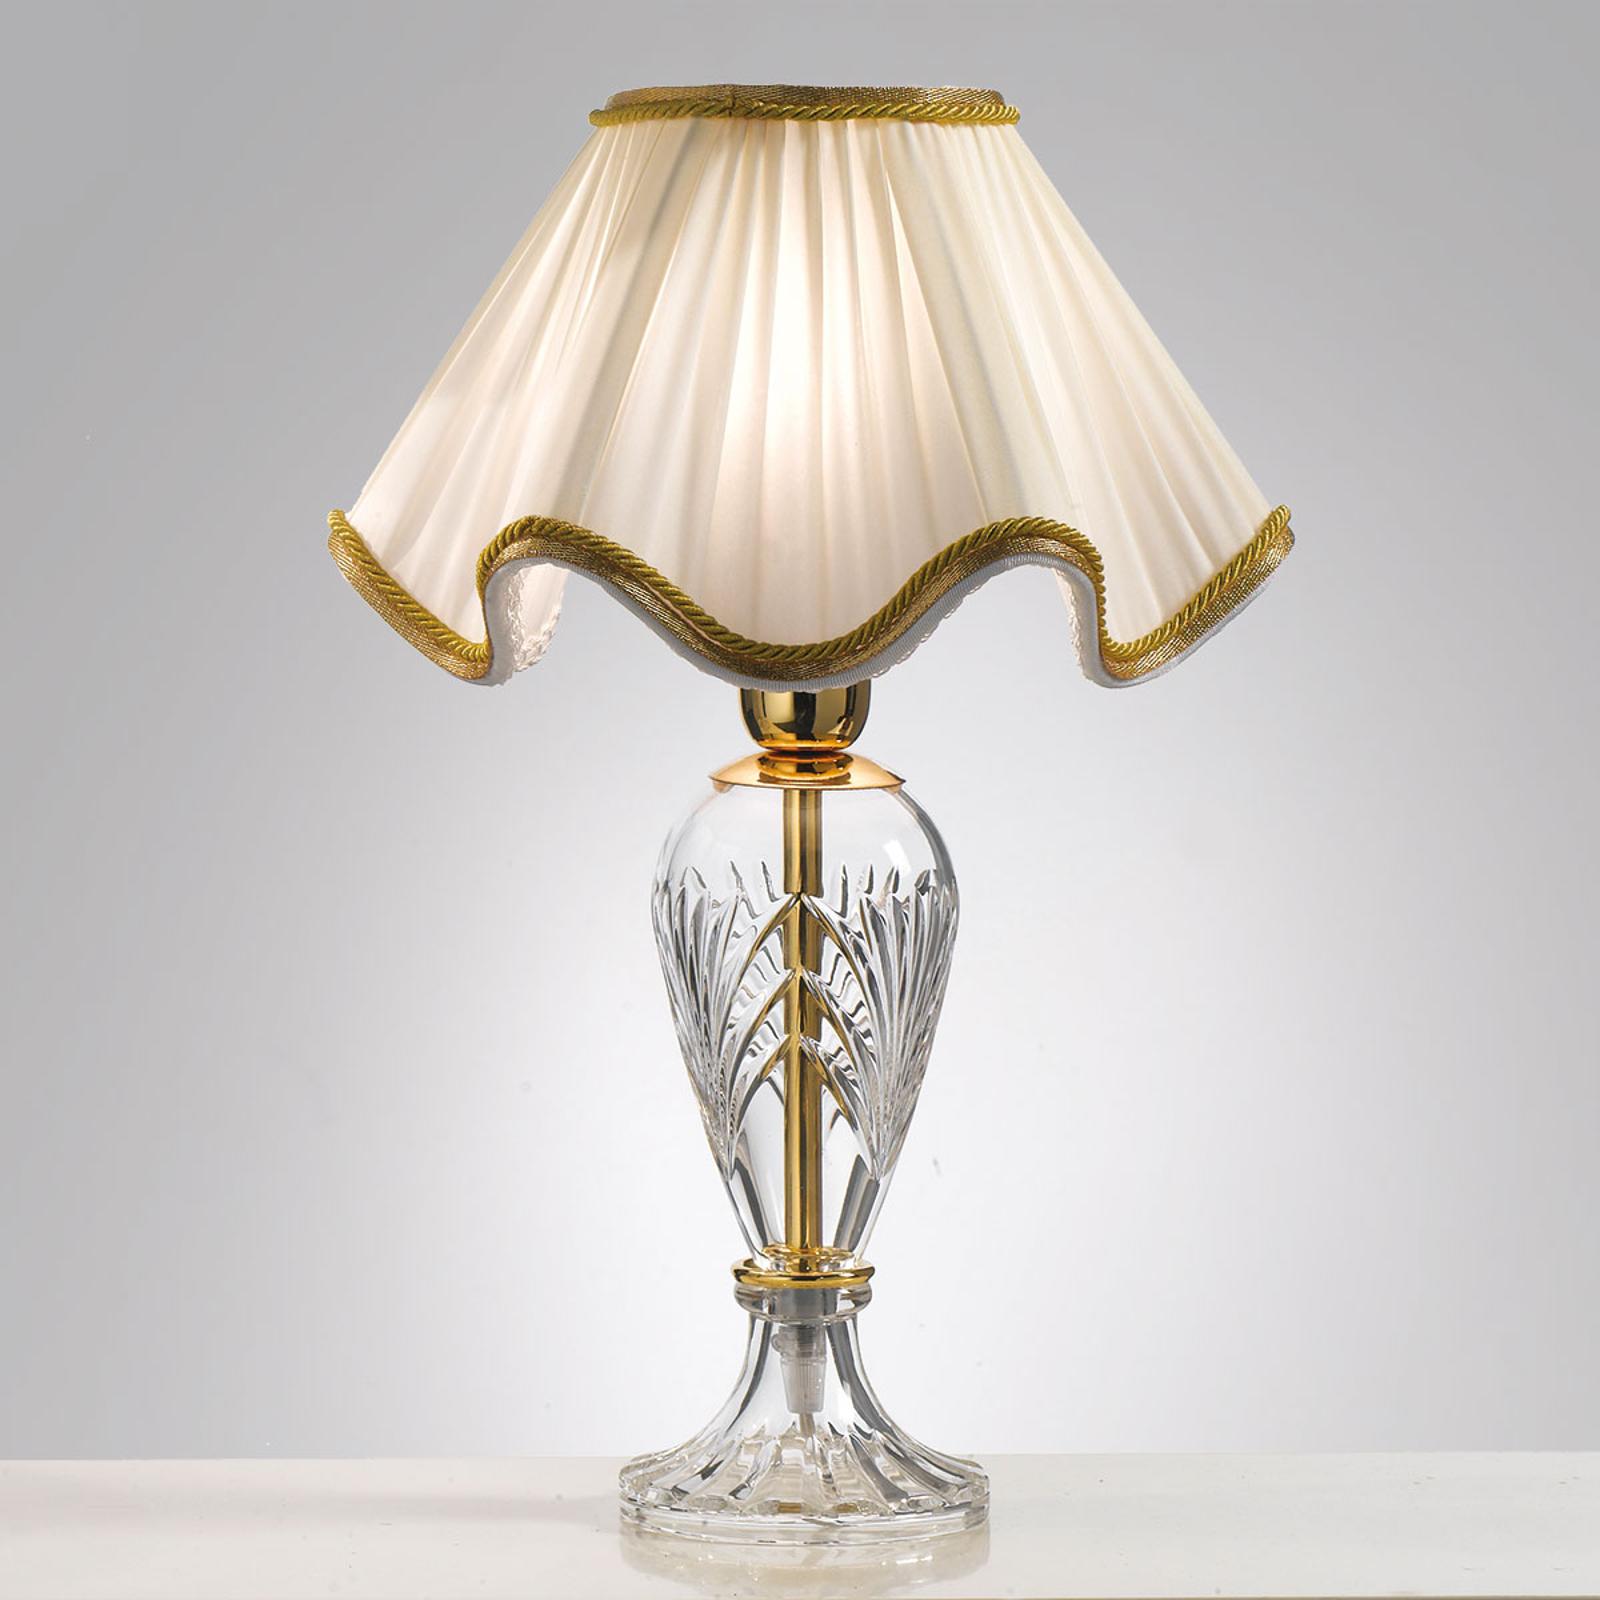 Vacker bordslampa Belle Epoque, 48 cm